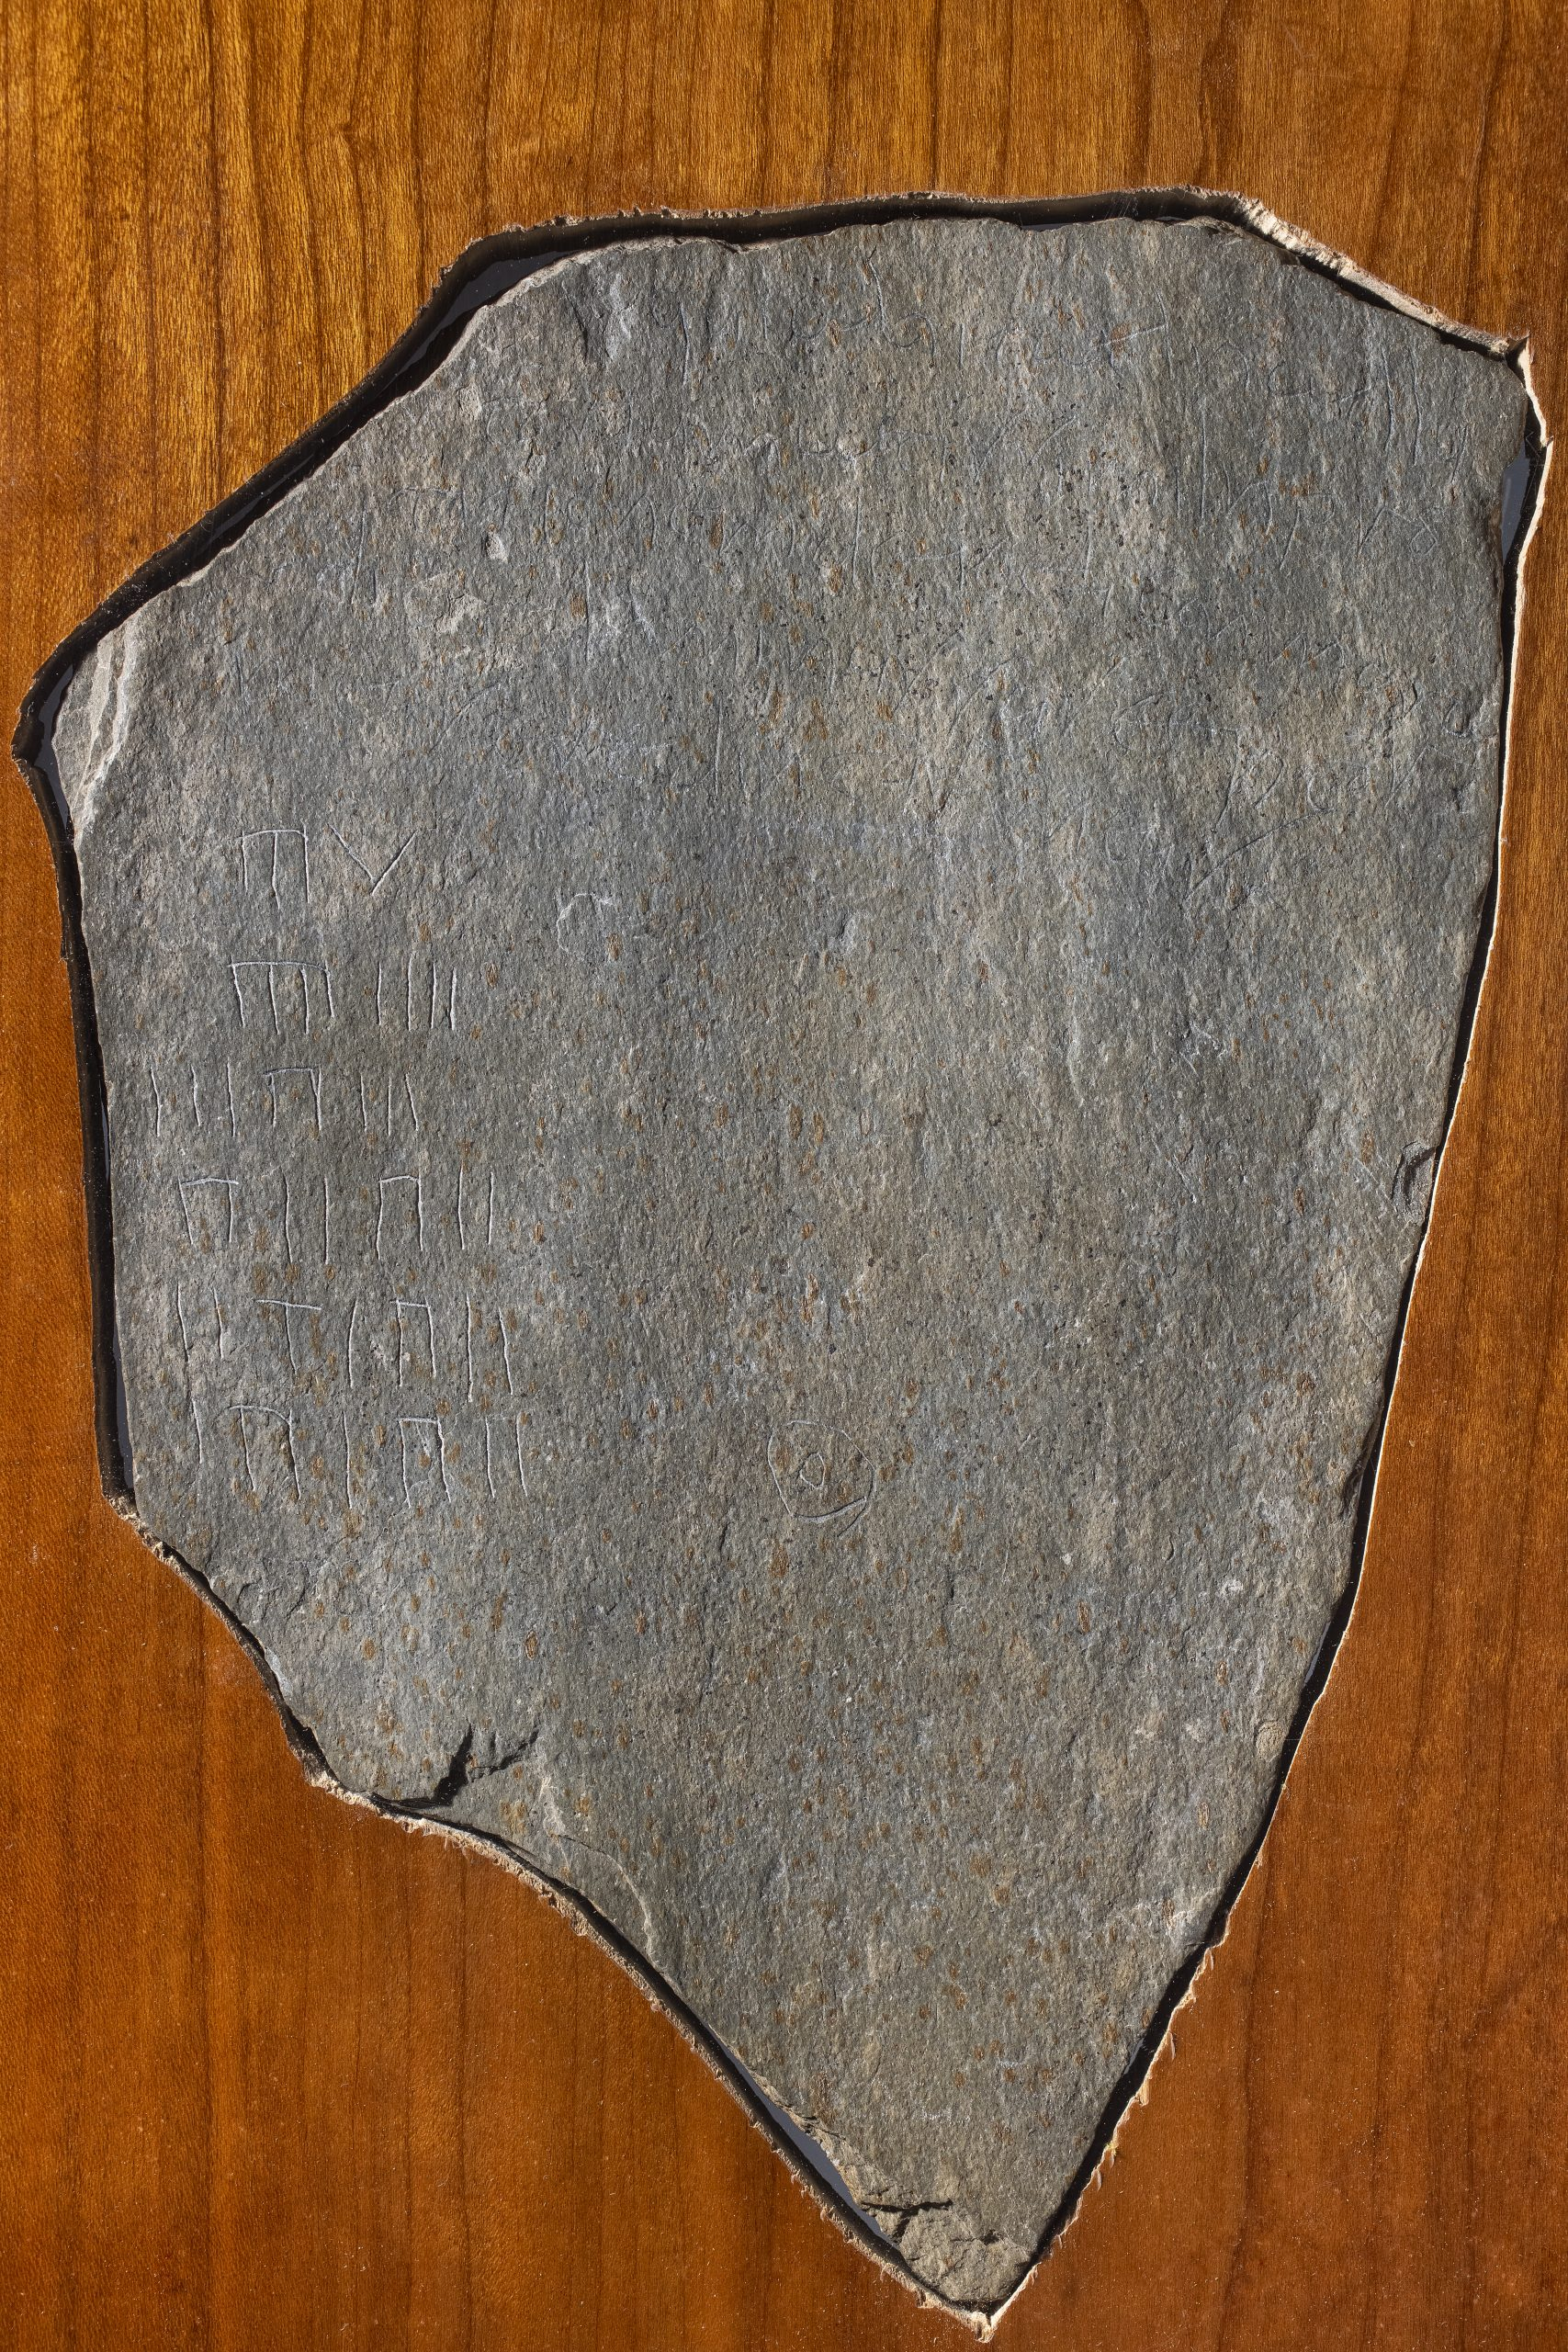 Pizarra de Diego ÁlvaroEl Castillo, Diego ÁlvaroÉpoca visigoda. Siglo VII Pizarra[68/./58]. Sala VI